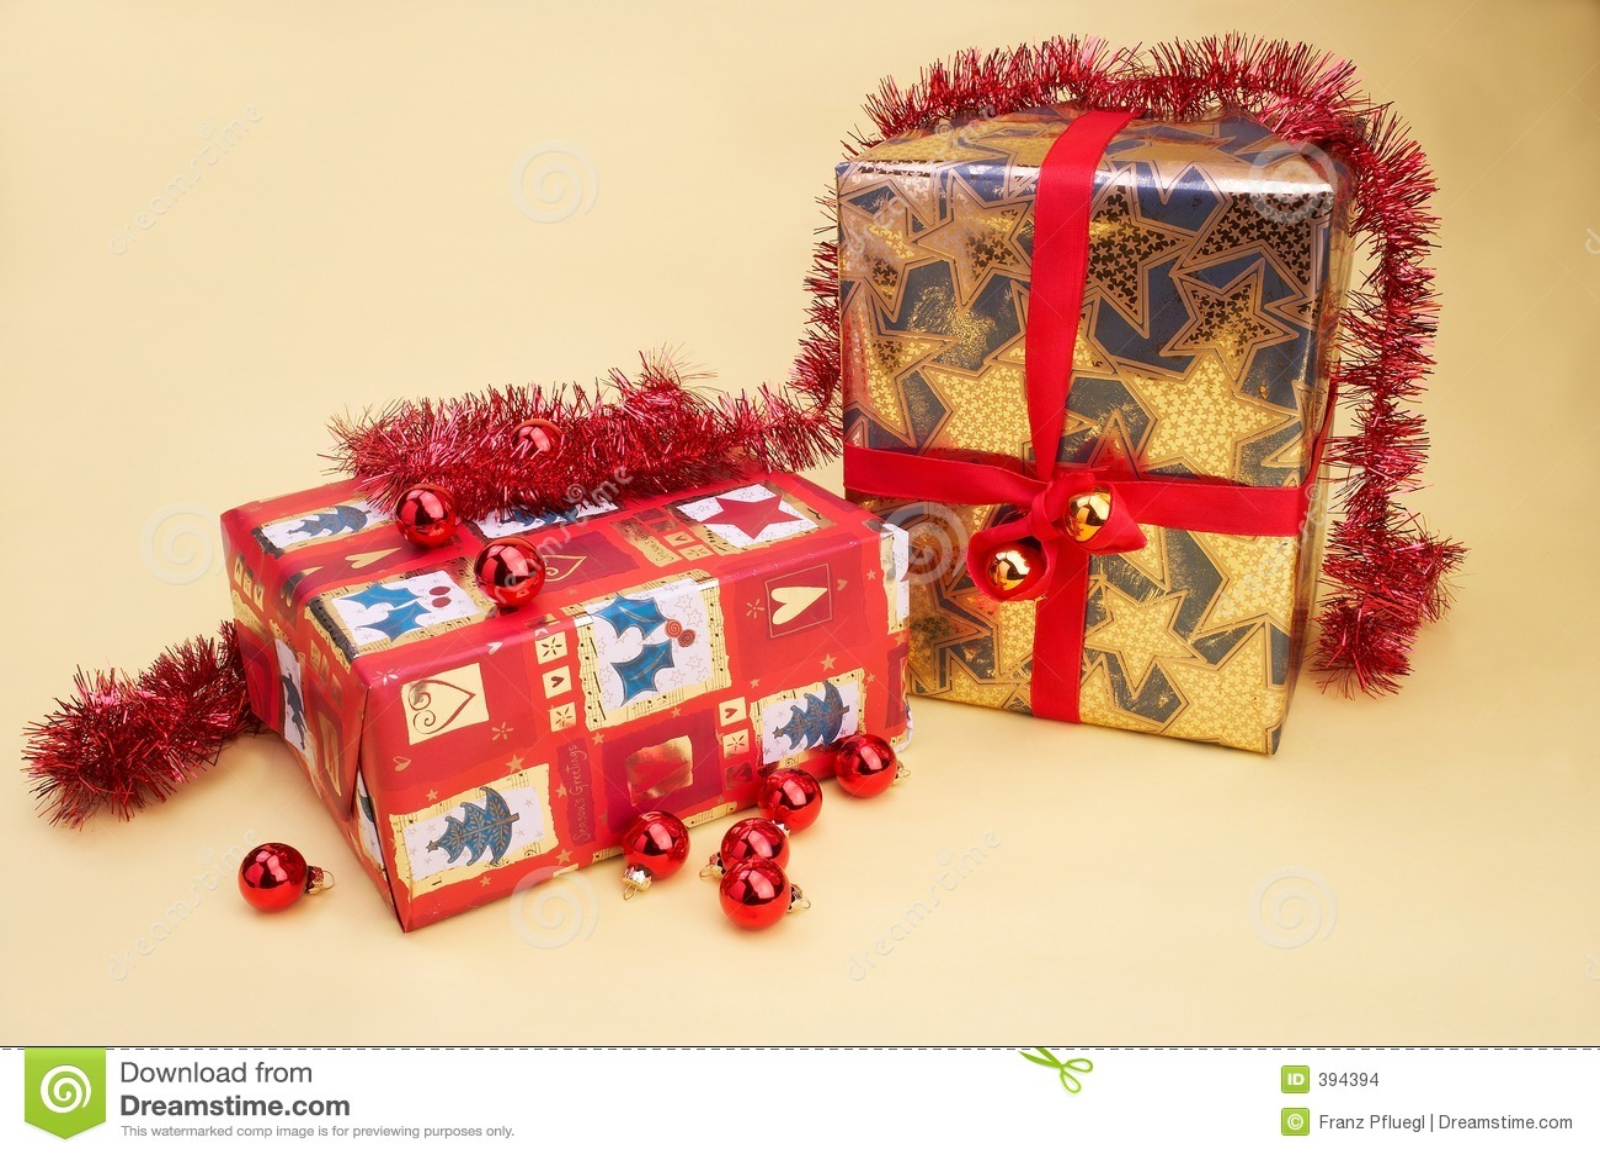 weihnachtsgeschenke christmas present stock images. Black Bedroom Furniture Sets. Home Design Ideas